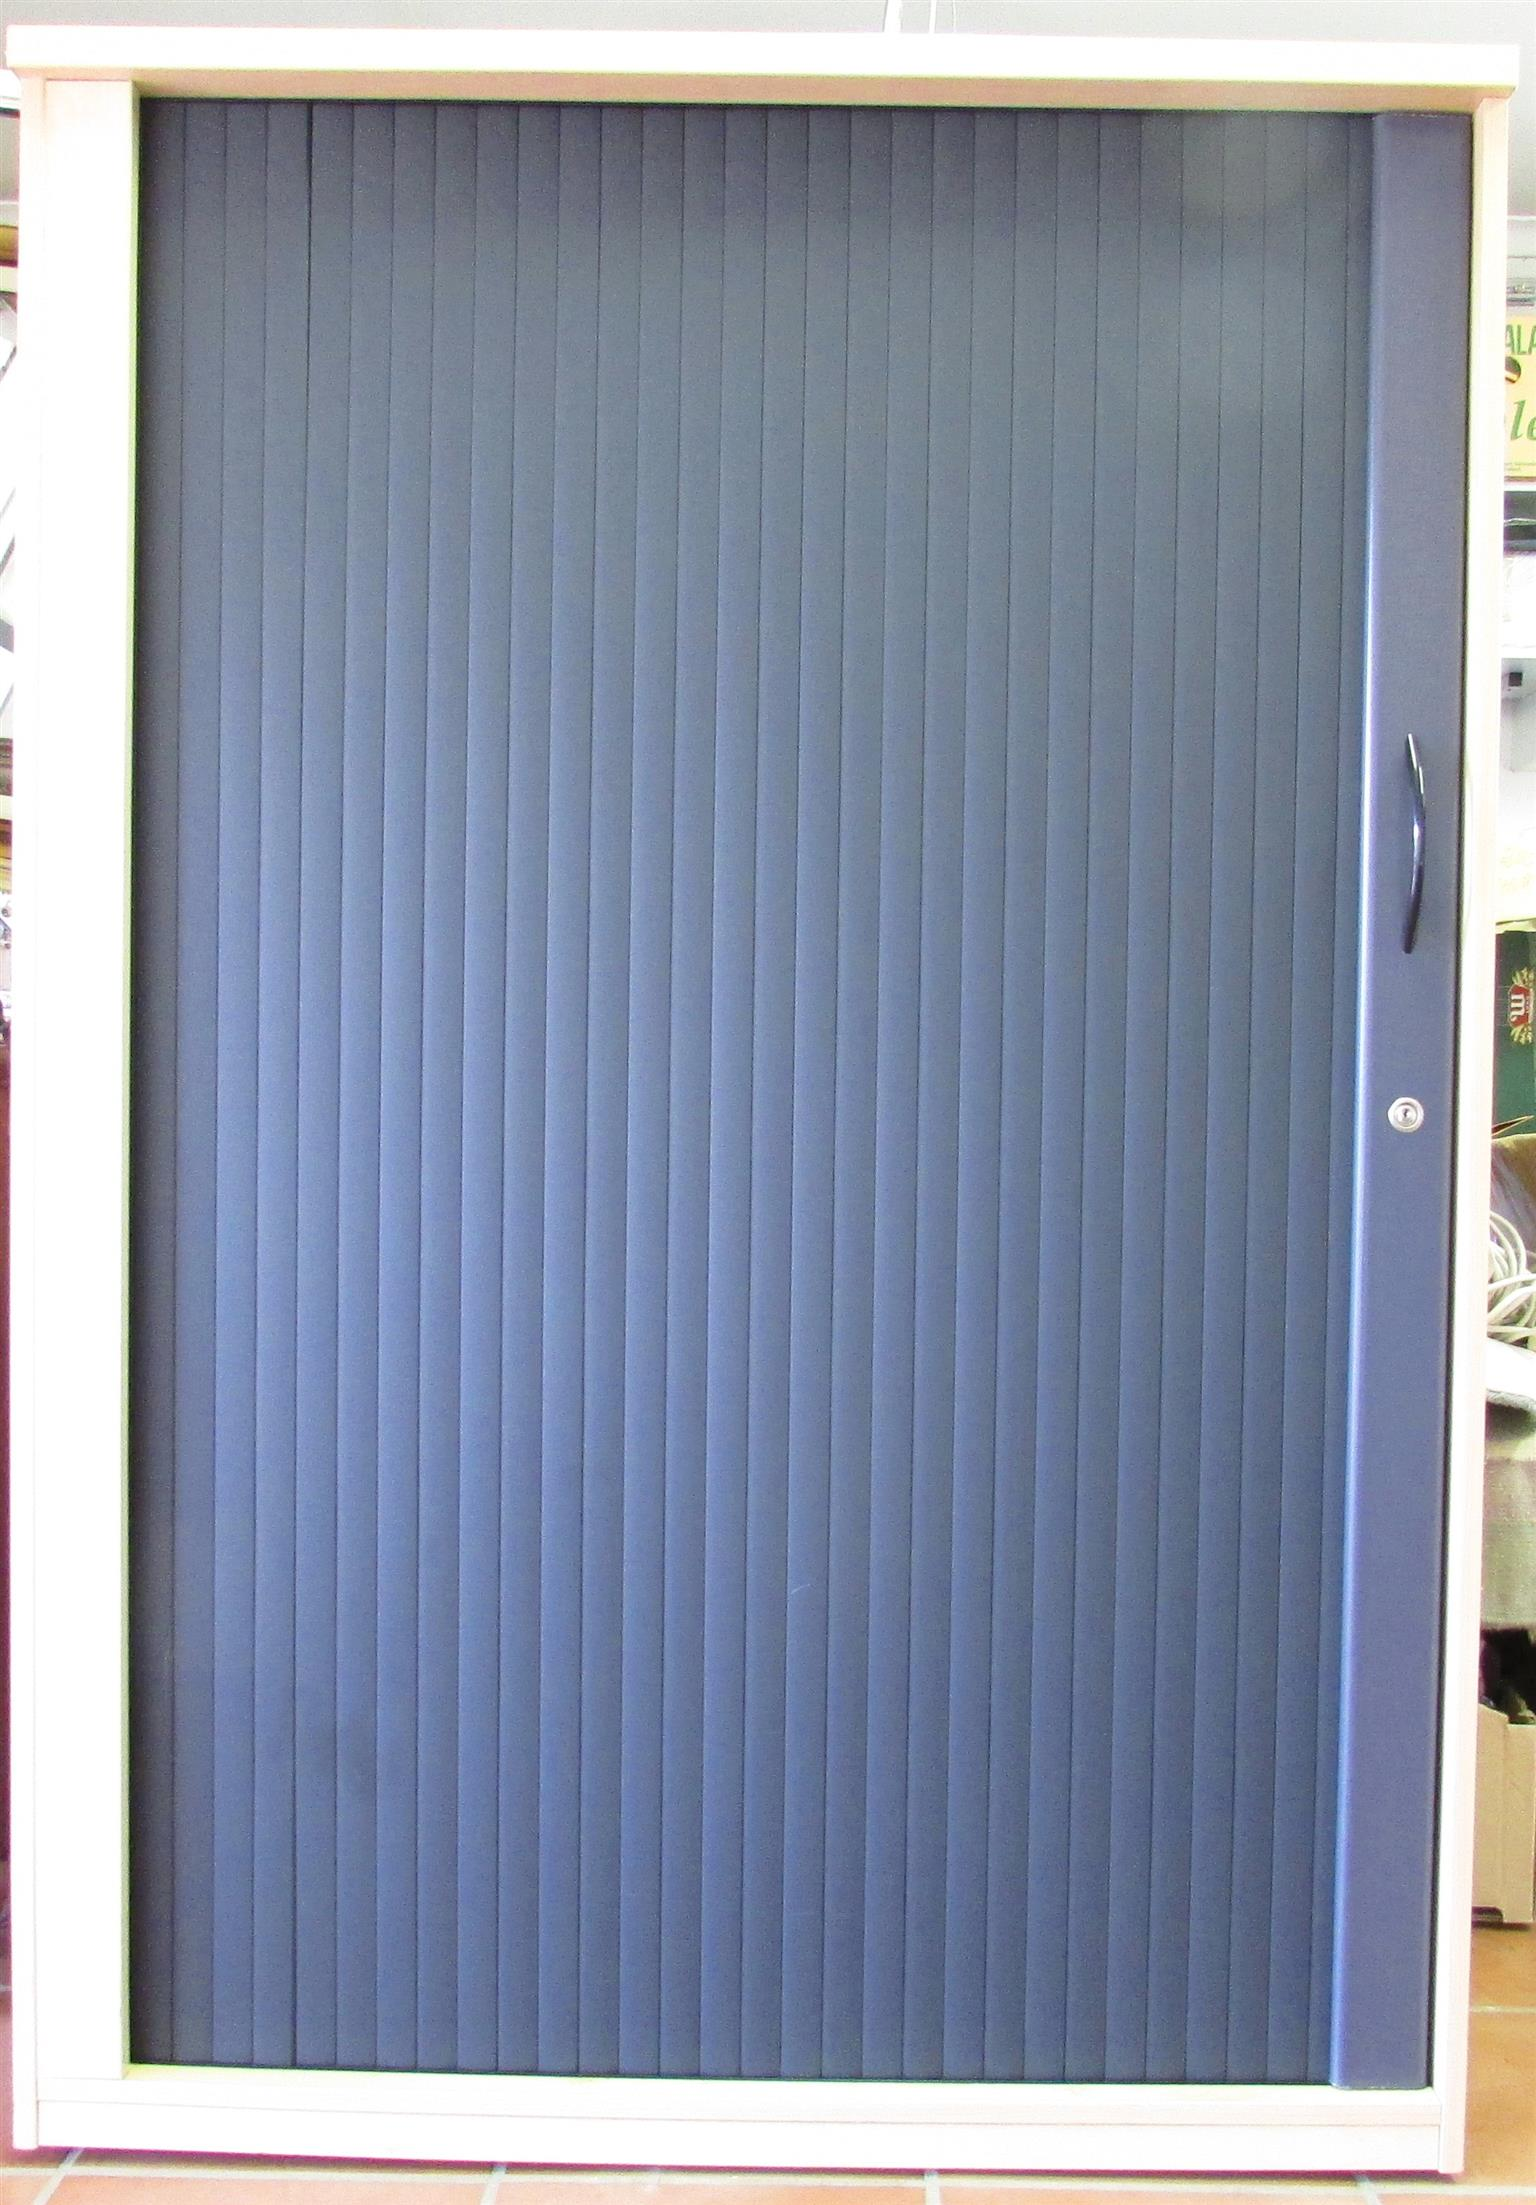 MAPLE ROLLER SHUTTER DOOR FILING CABINET & MAPLE ROLLER SHUTTER DOOR FILING CABINET   Junk Mail